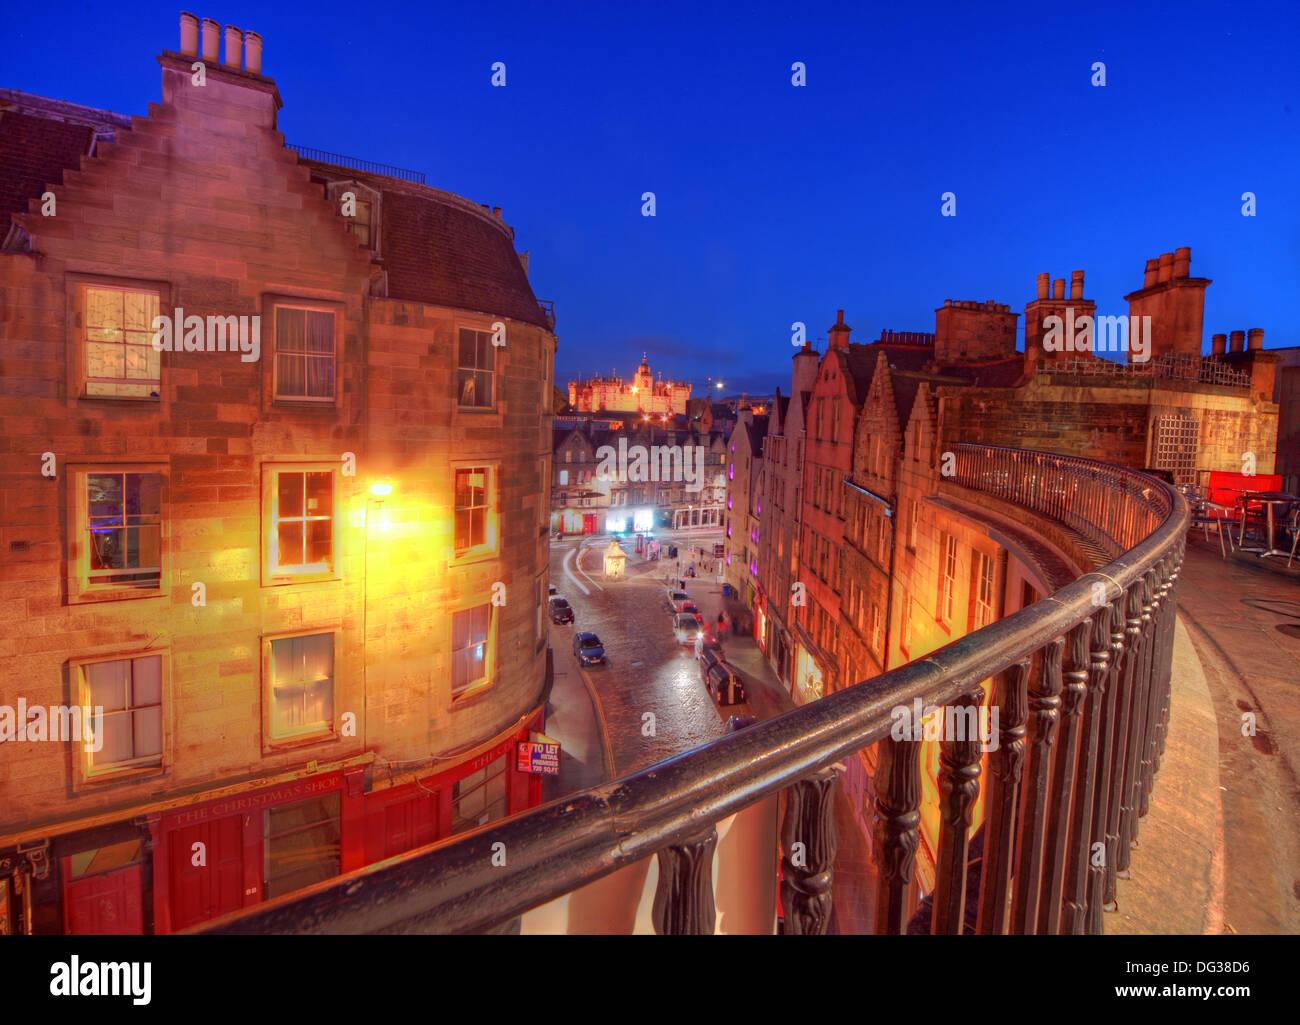 Victoria,Street,Edinburgh,City,Scotland,UK,at,dusk,Night,Shot,Victoria,St,West Bow,world,heritage,site,Old,Town,Lothian,Lothians,EH1,2JW,EH12JW,st,blue,sky,west,bow,westbow,mixed,lighting,history,historic,building,buildings,architecture,at,night,nightshot,Gotonysmith,st.,tourist,tourism,trail,walk,walkways,around,tour,tours,railing,railings,iron,metal,victorian,old,fashioned,oldfashioned,classic,haunted,haunting,Edinburg,Ediburgh,Buy Pictures of,Buy Images Of,Scotlands History,Scotlands History